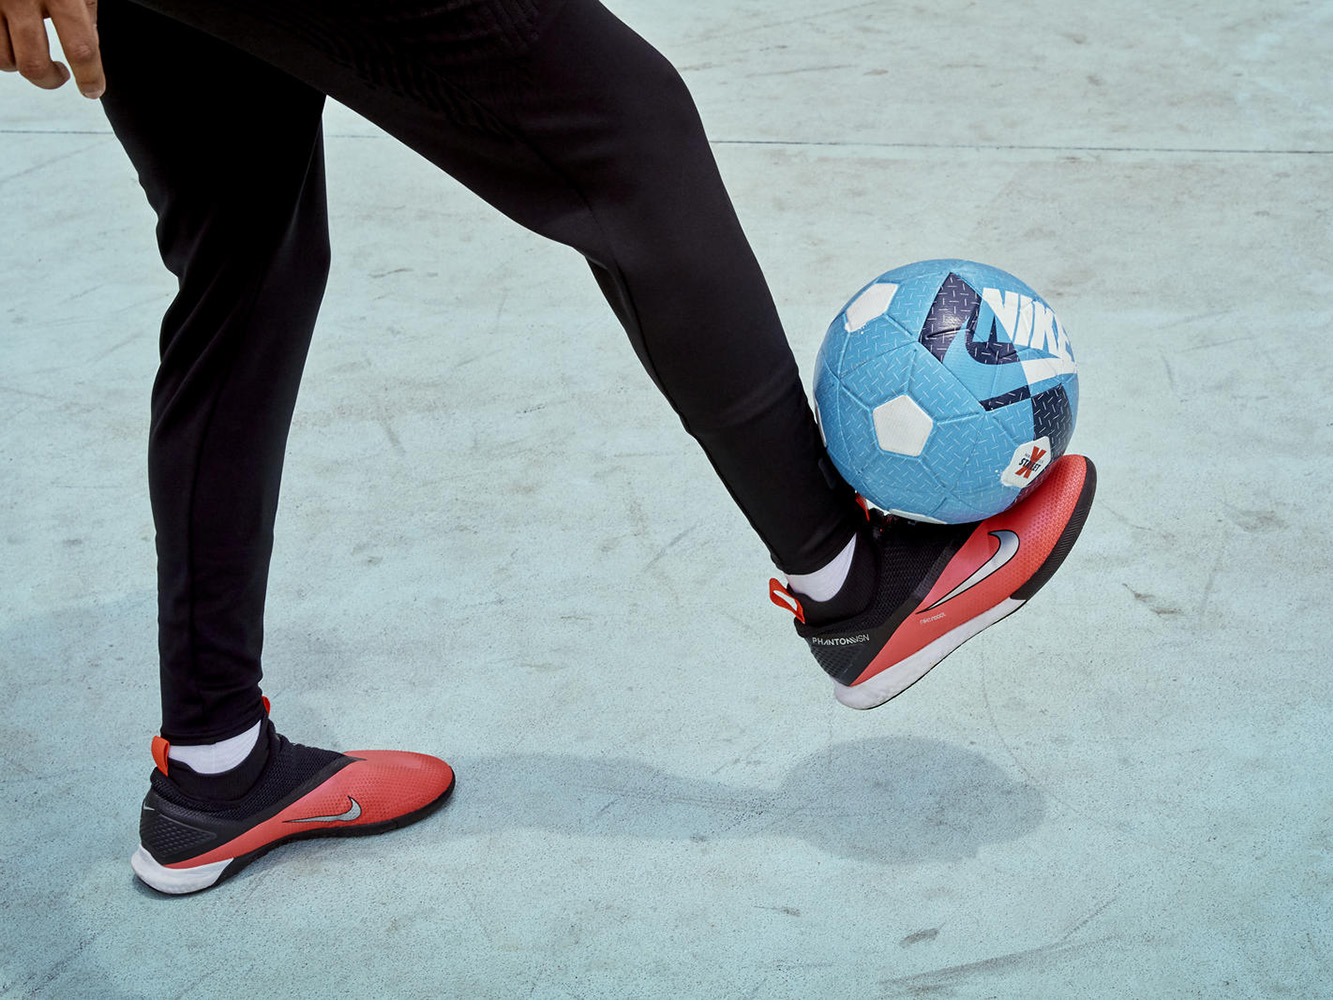 Nike_Football_PhantomVSN2_IC_93365